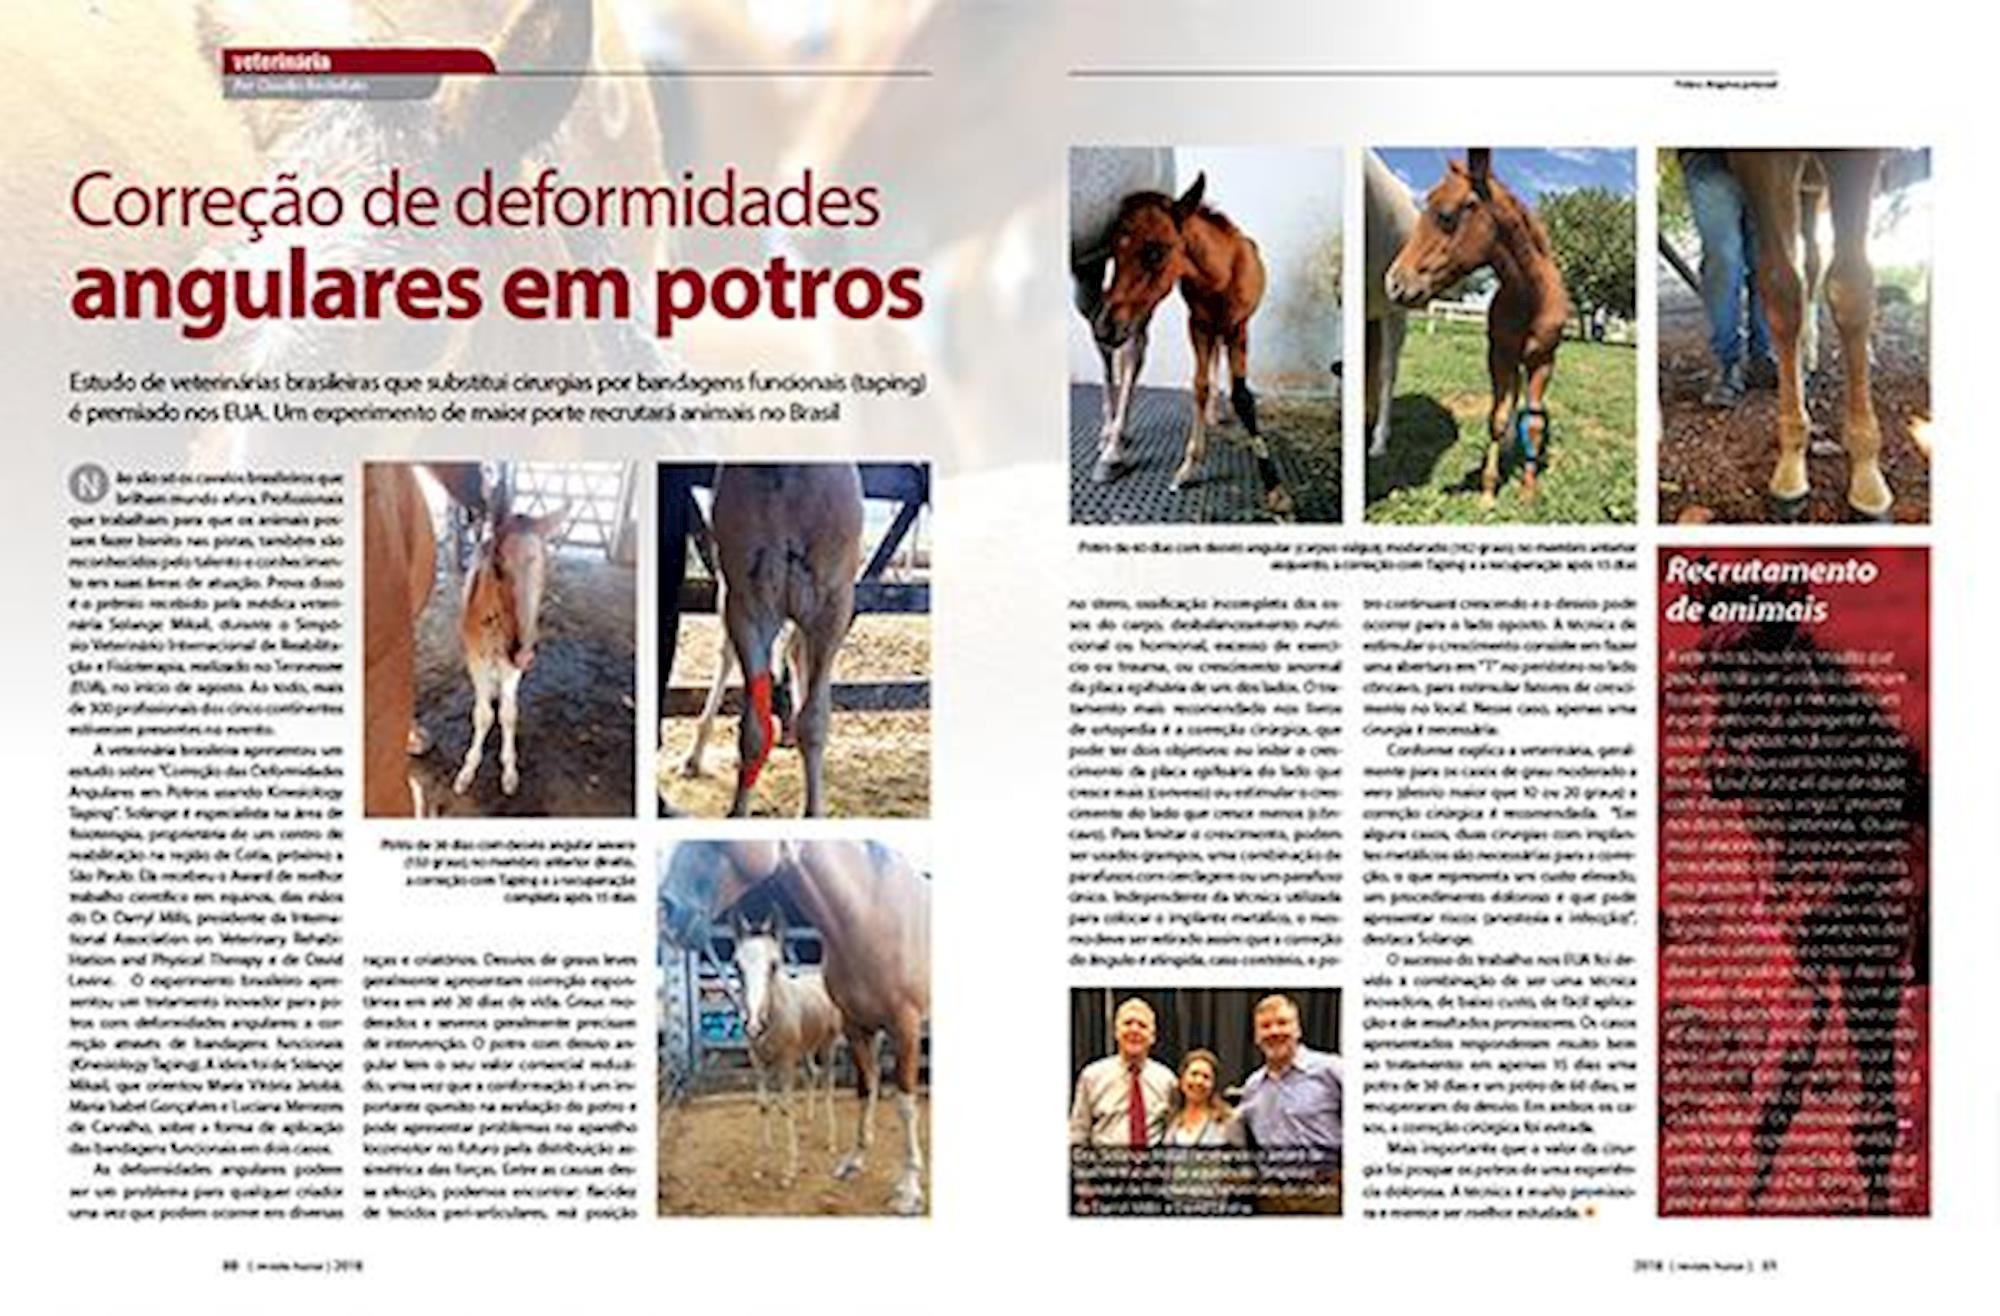 Aprumos de cavalos, Taping, Bandagem funcional, Solange Mikail, Revista Horse,